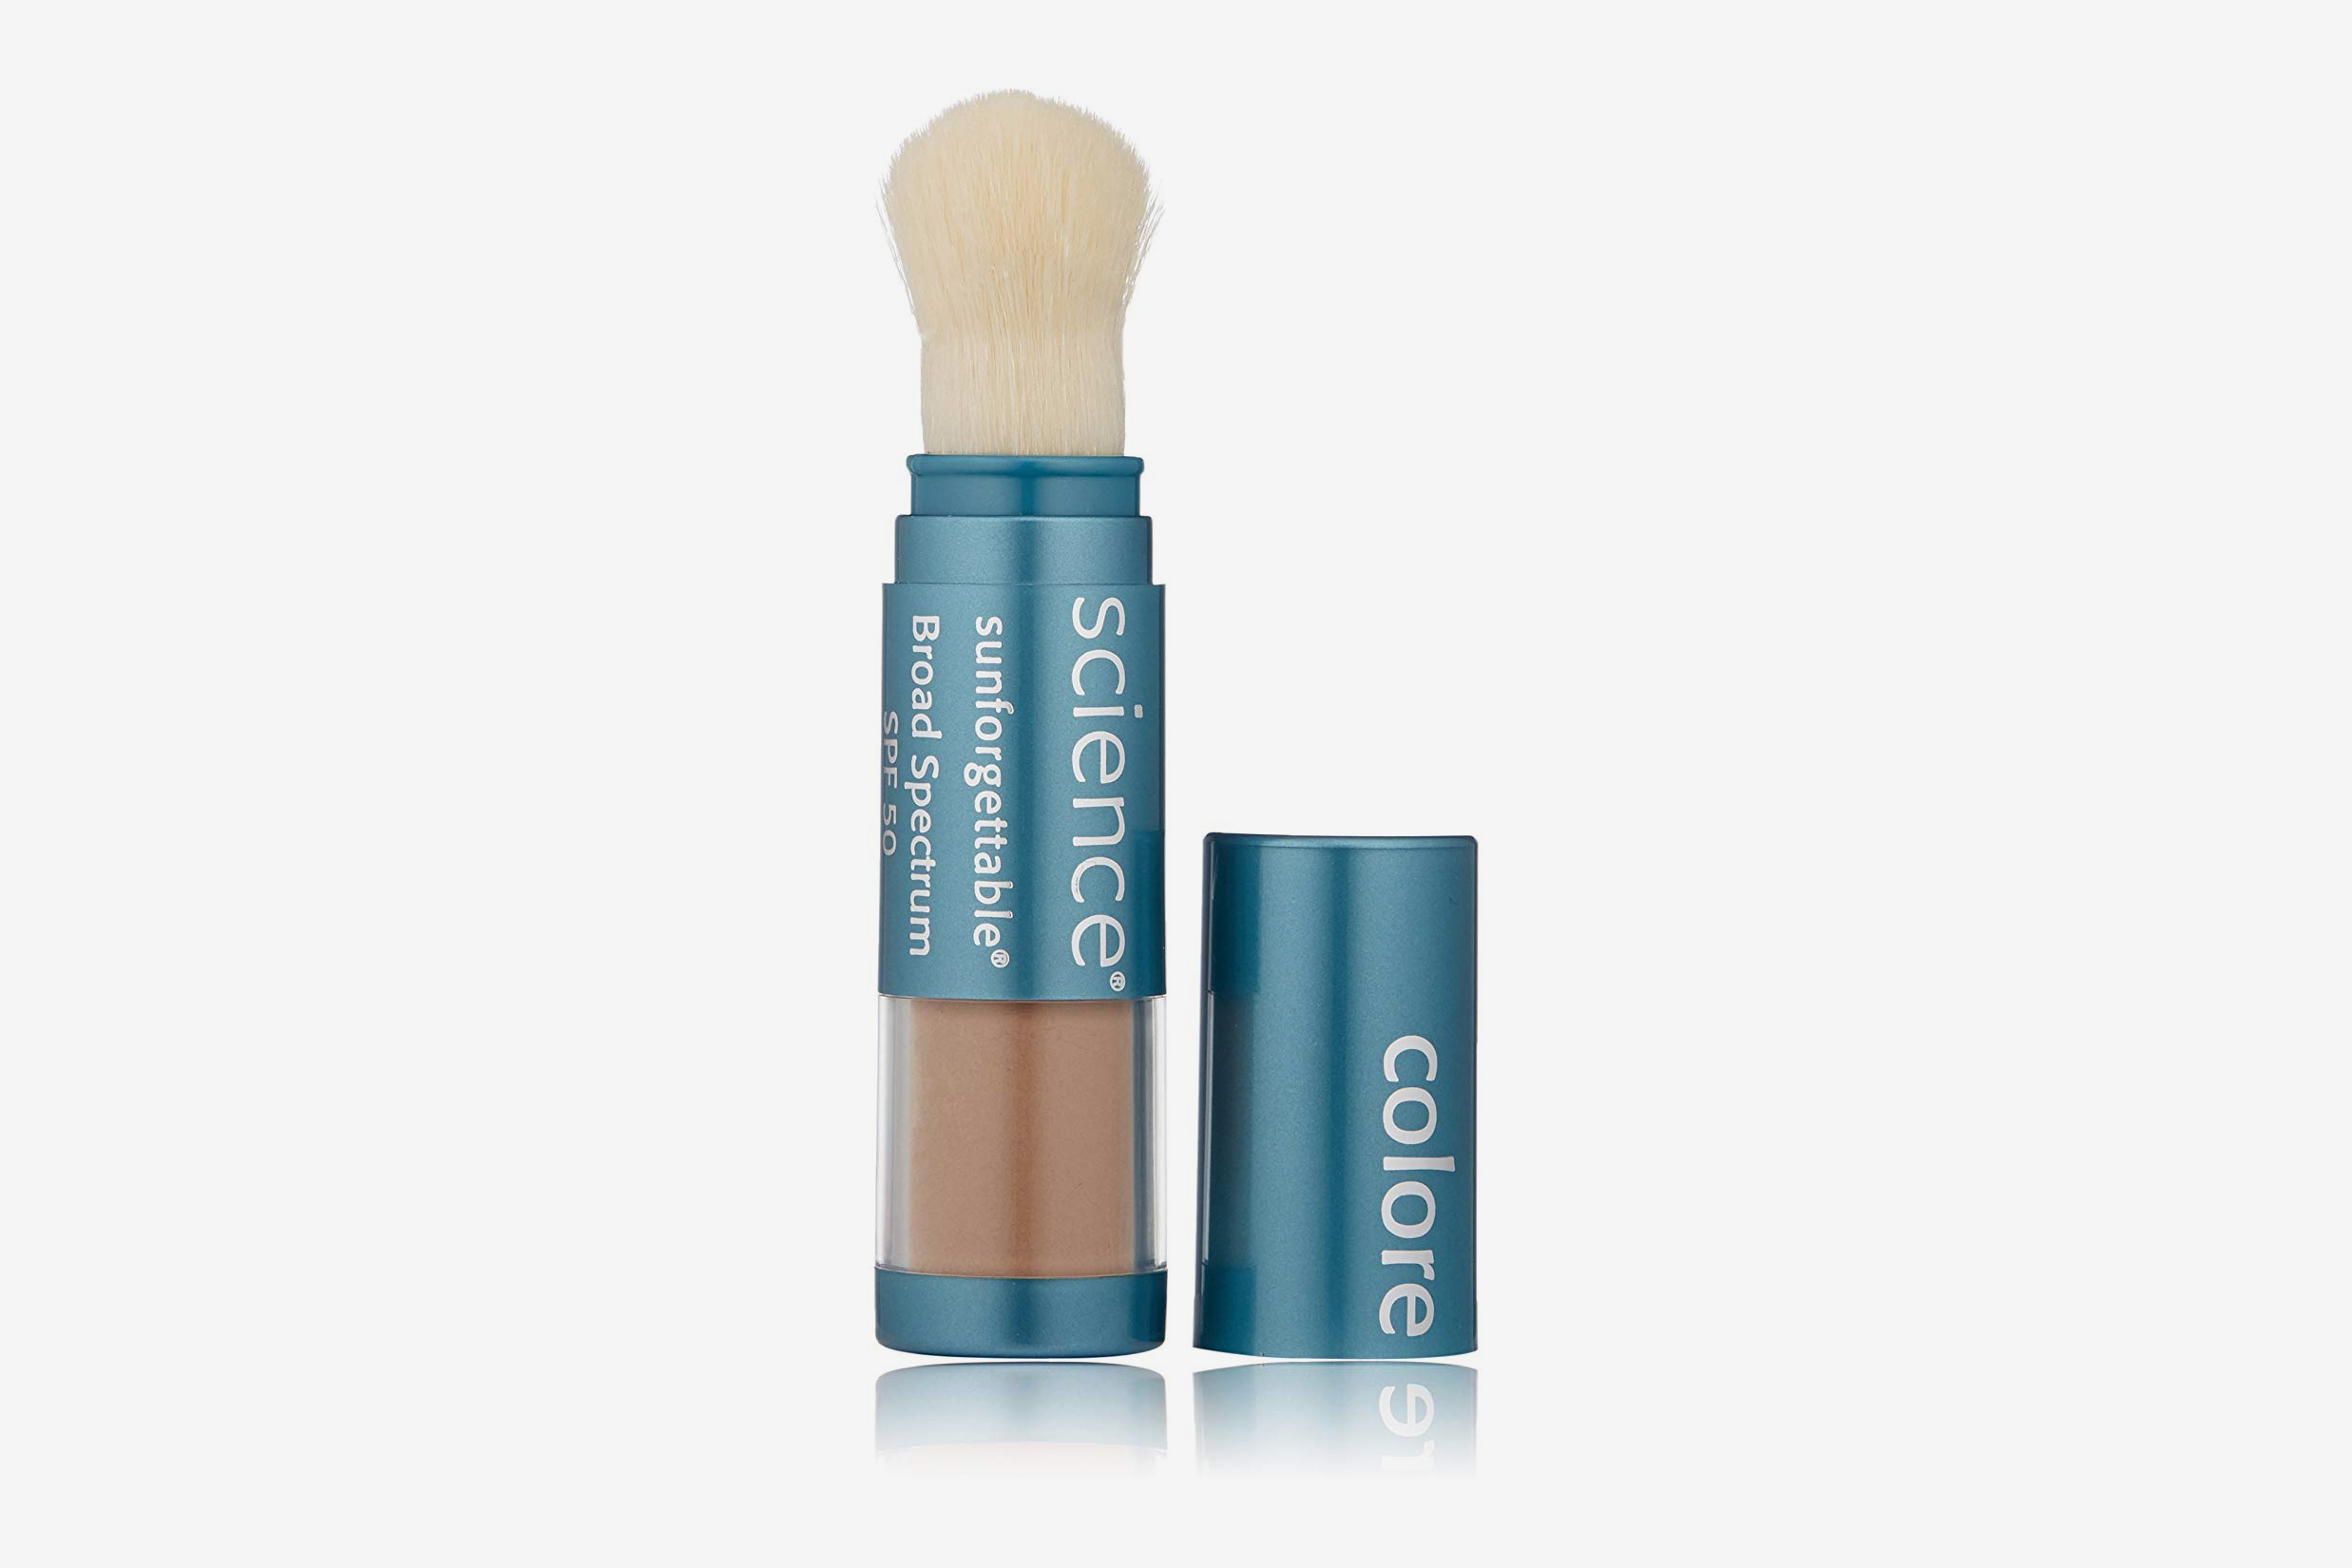 Colorescience Sunforgettable Mineral SPF 50 Sunscreen Brush